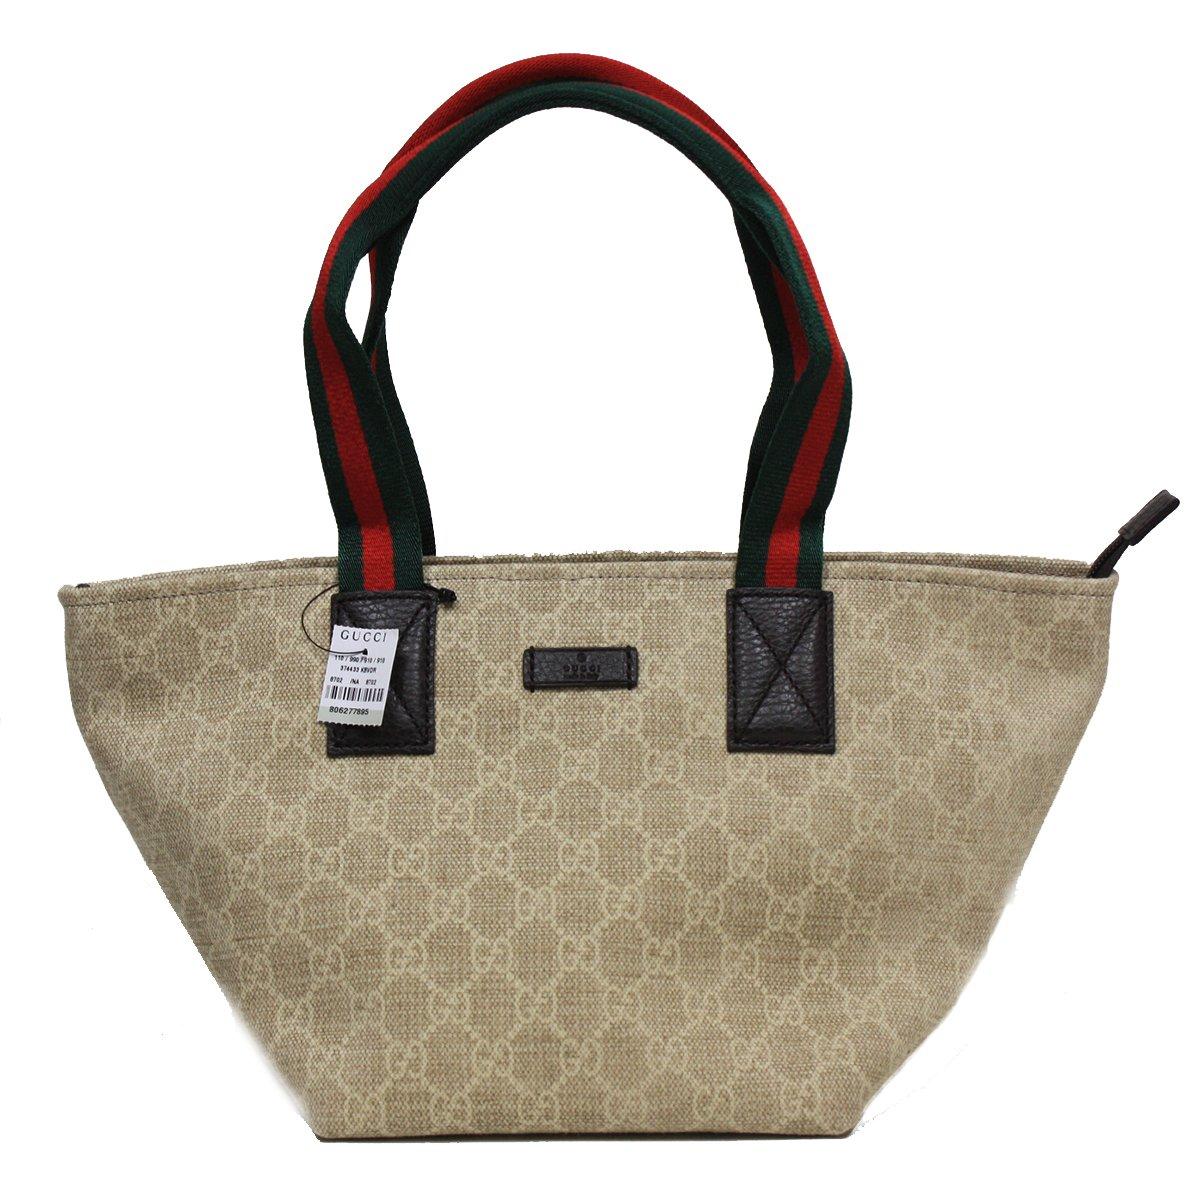 Gucci Washed GG Canvas Logo Duffel Bag Tote Handbag 374433, Web Red/Green